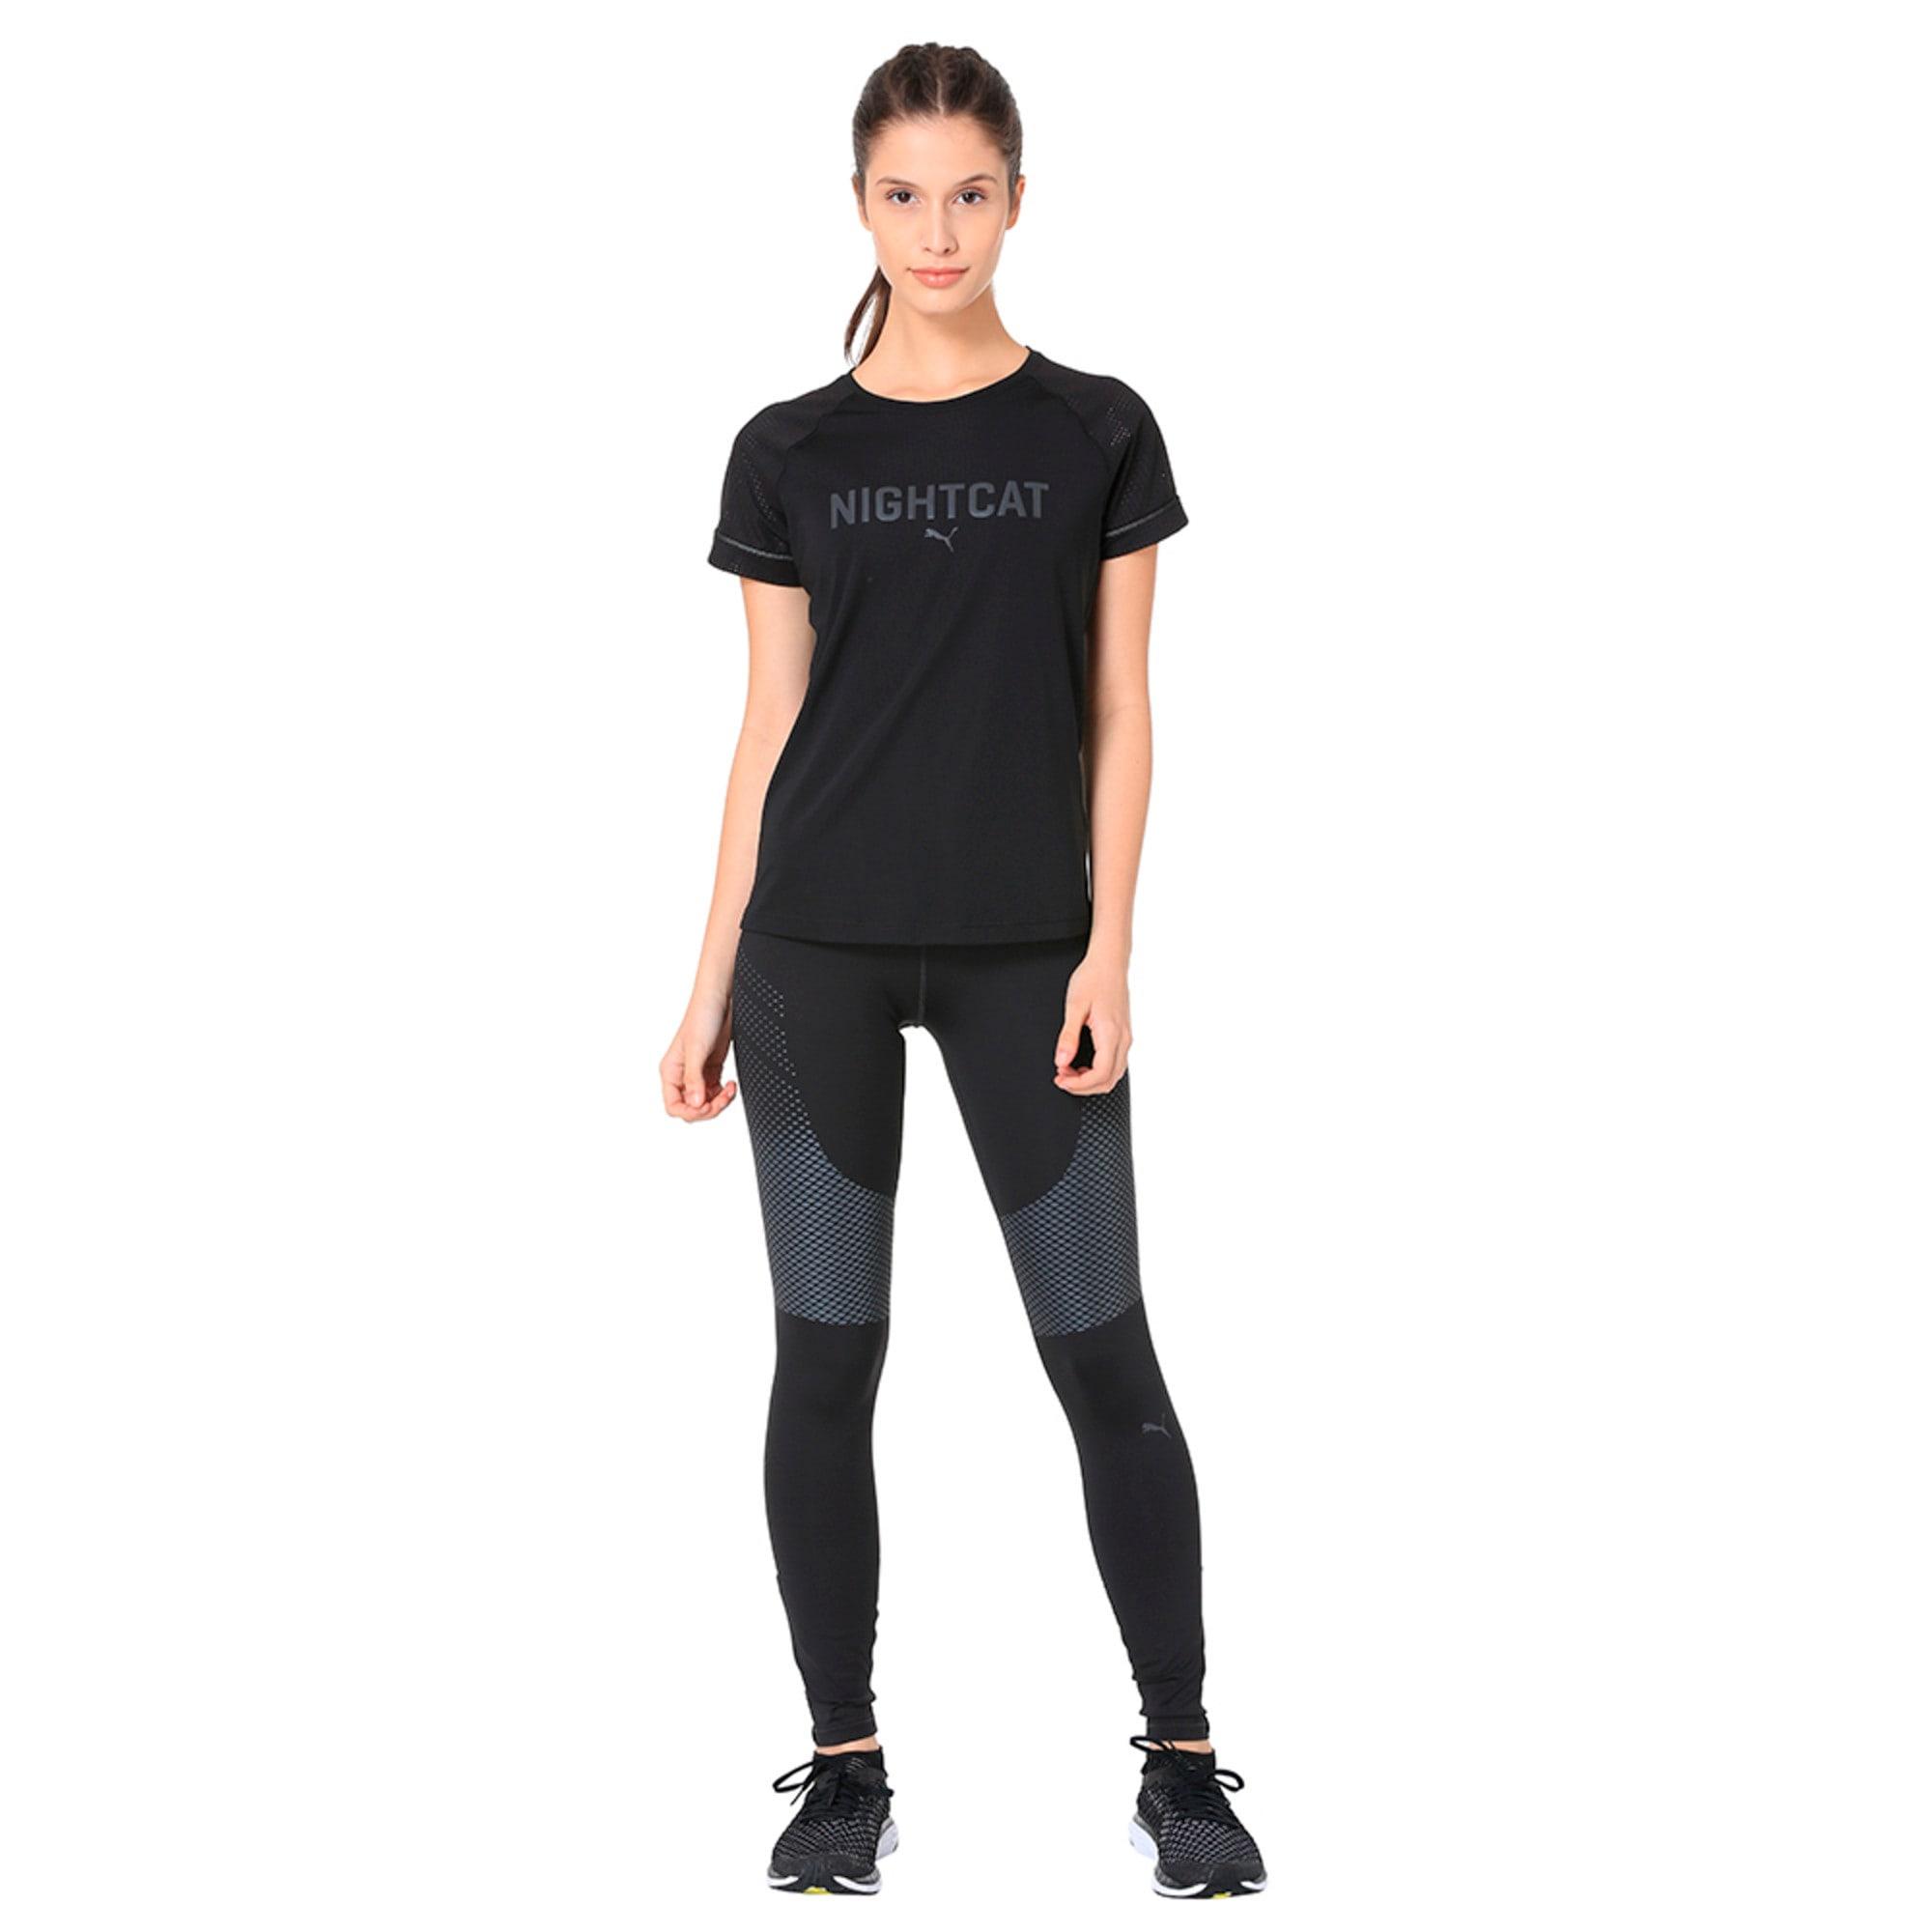 Thumbnail 3 of NightCat Women's Short Sleeve T-Shirt, Puma Black, medium-IND